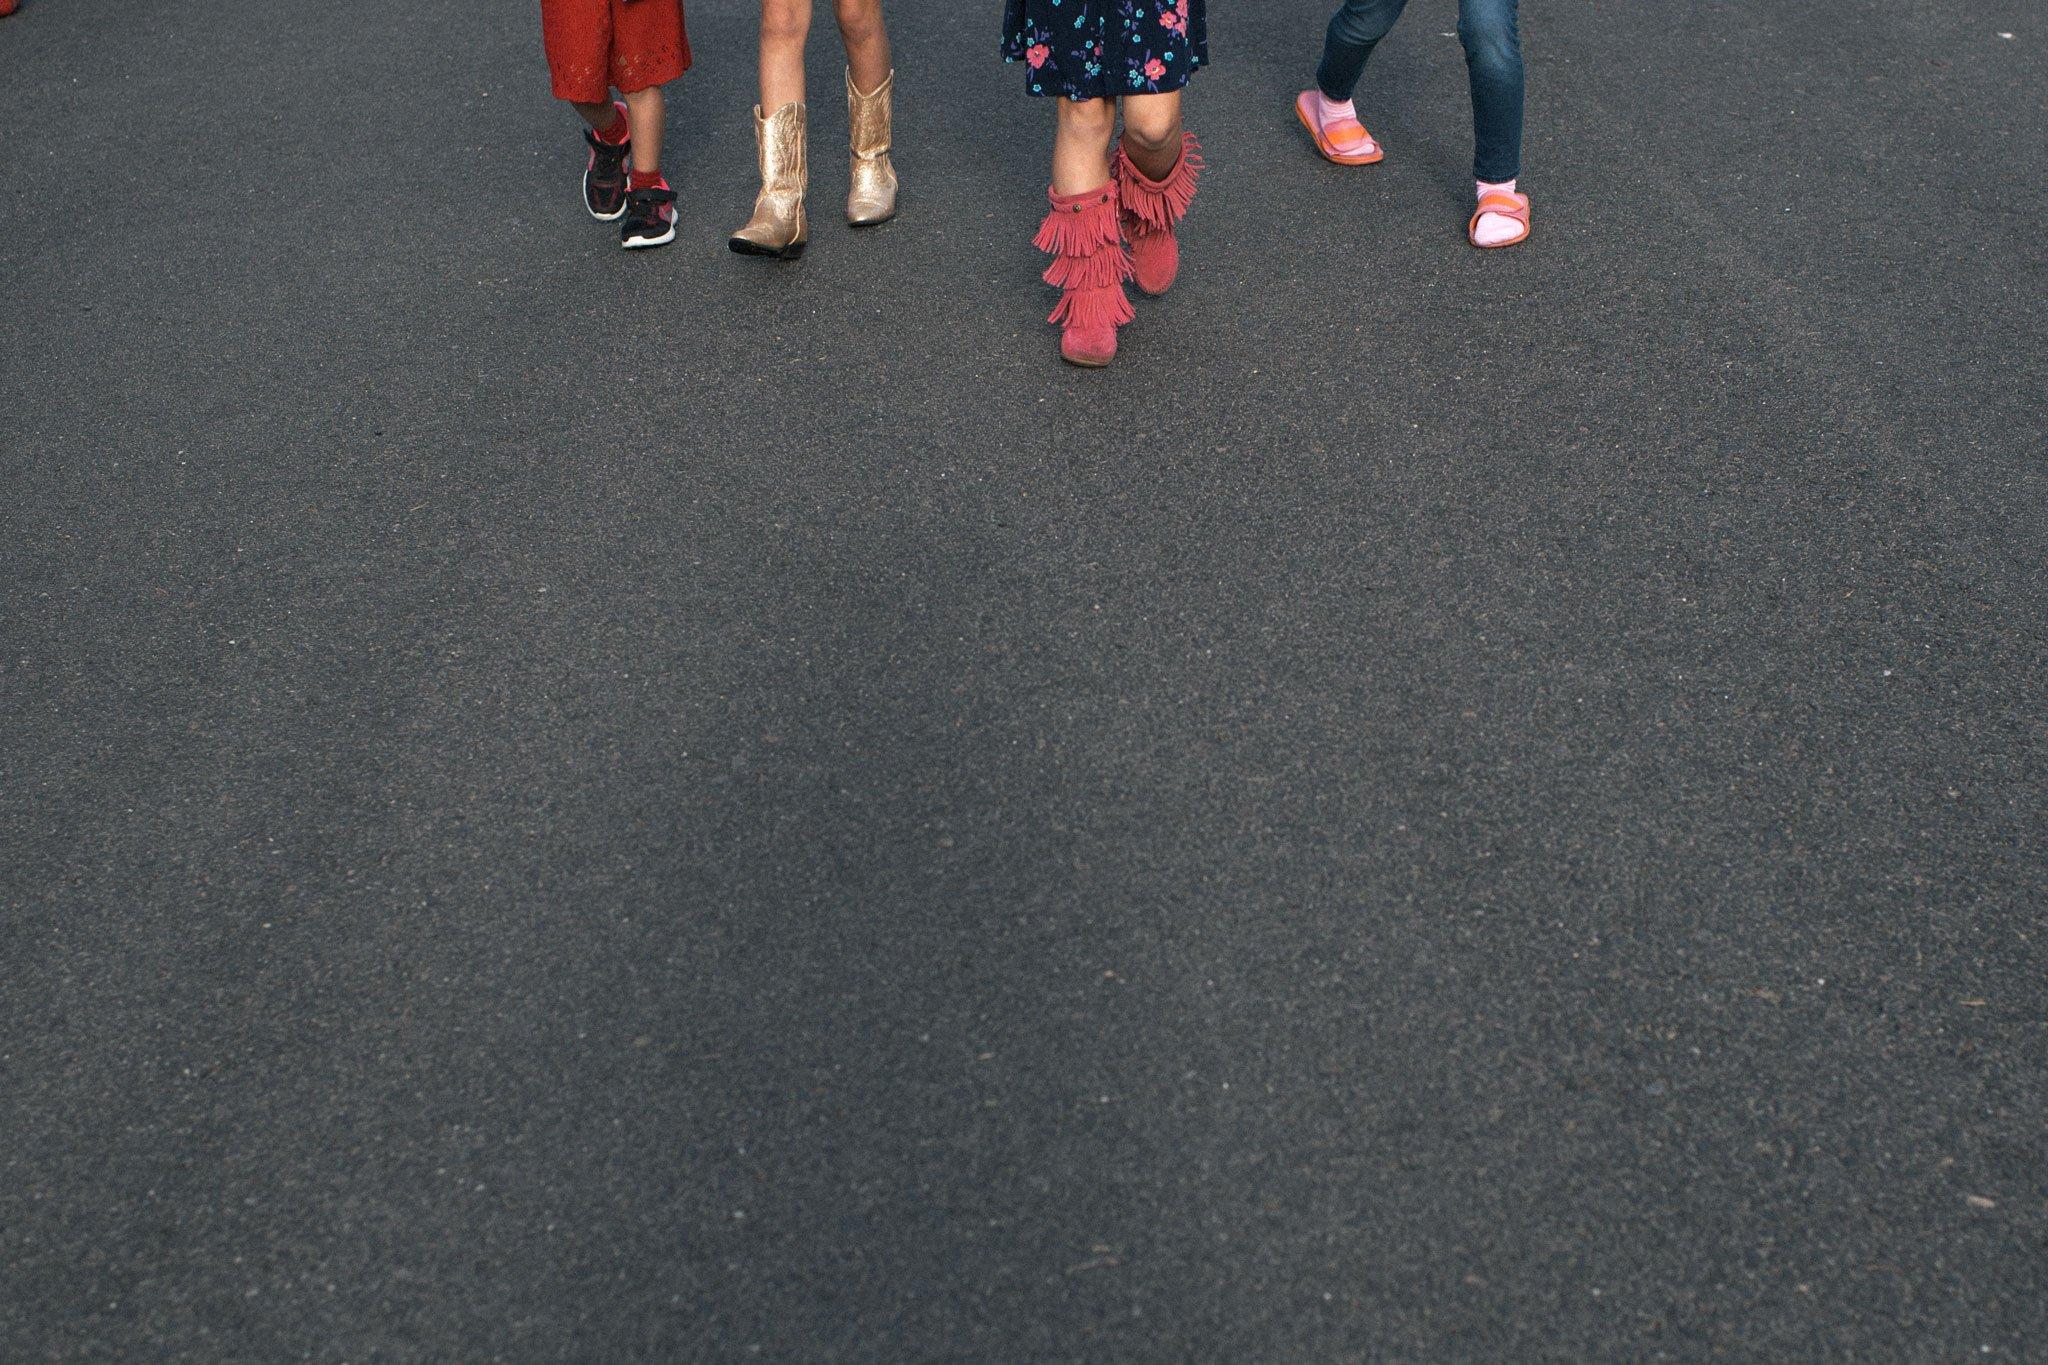 boy walking with girls